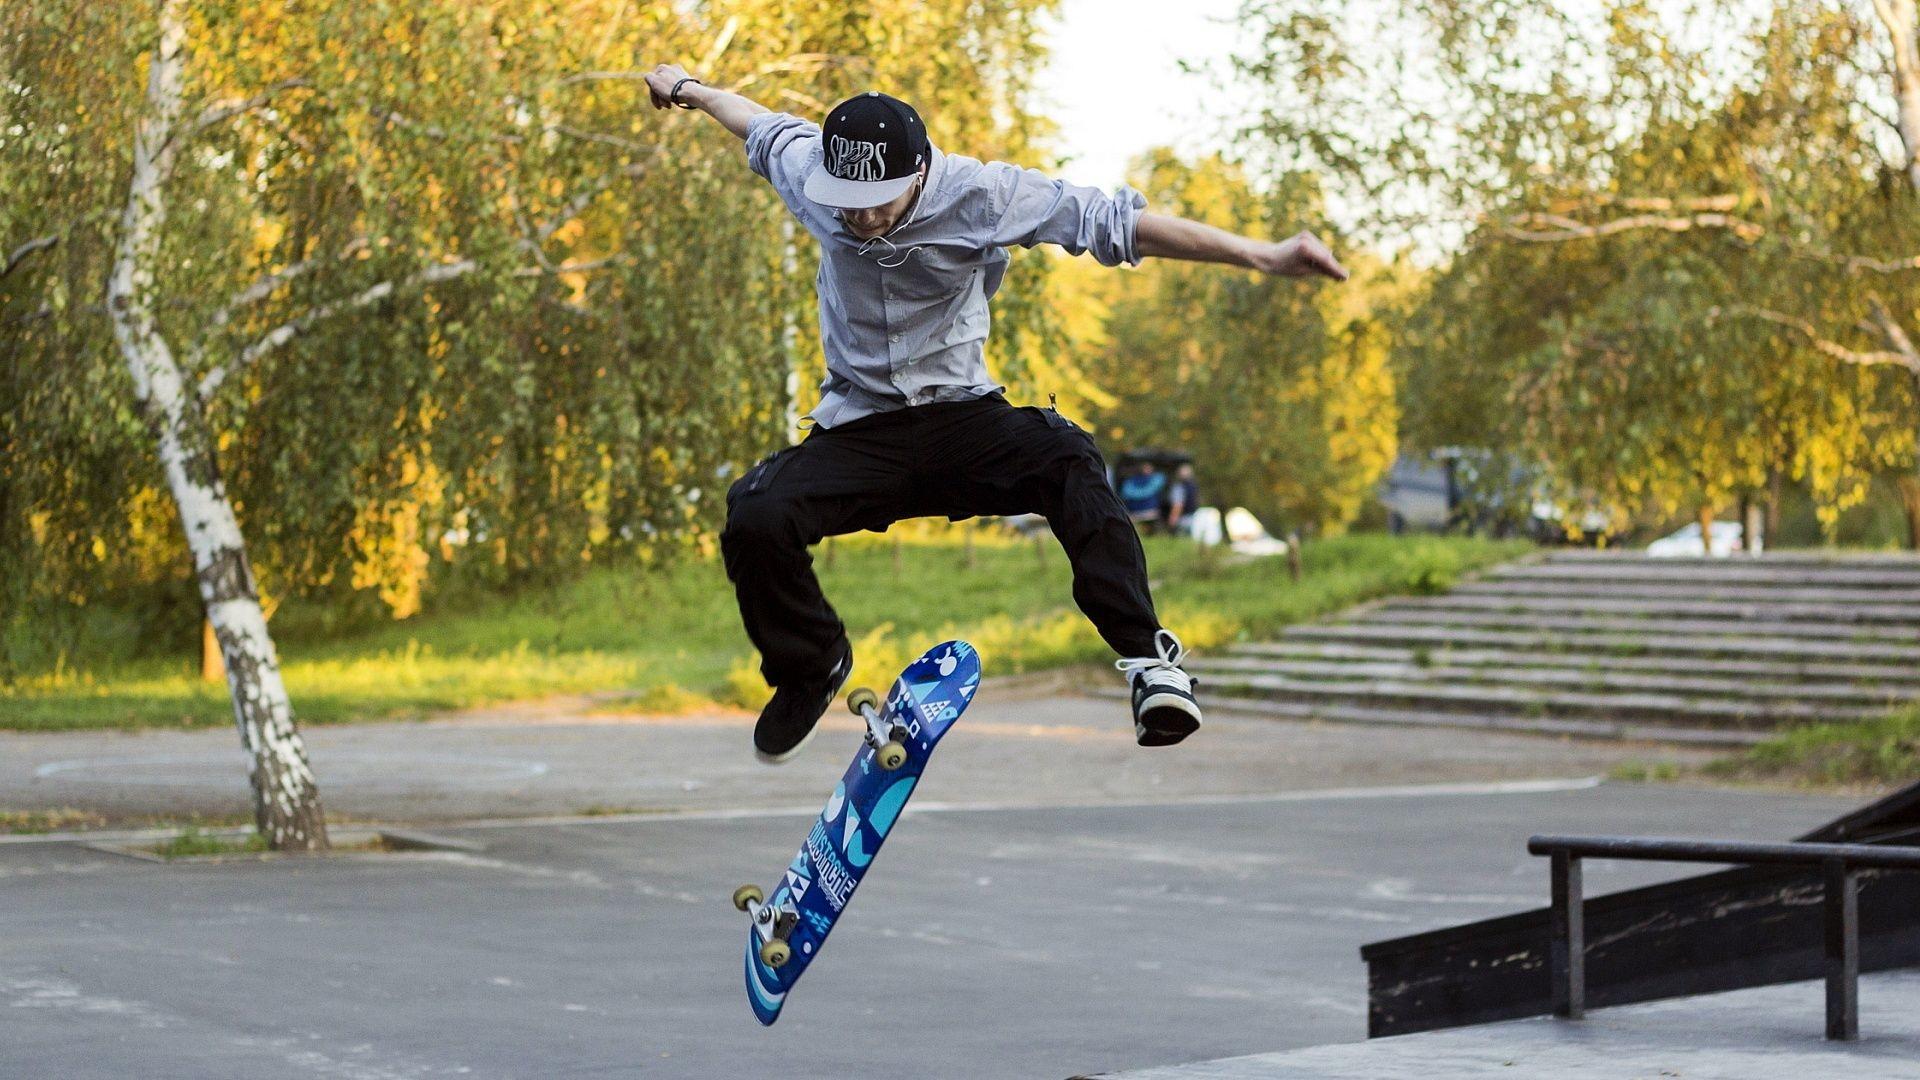 42 Spitfire Wallpaper Skateboard